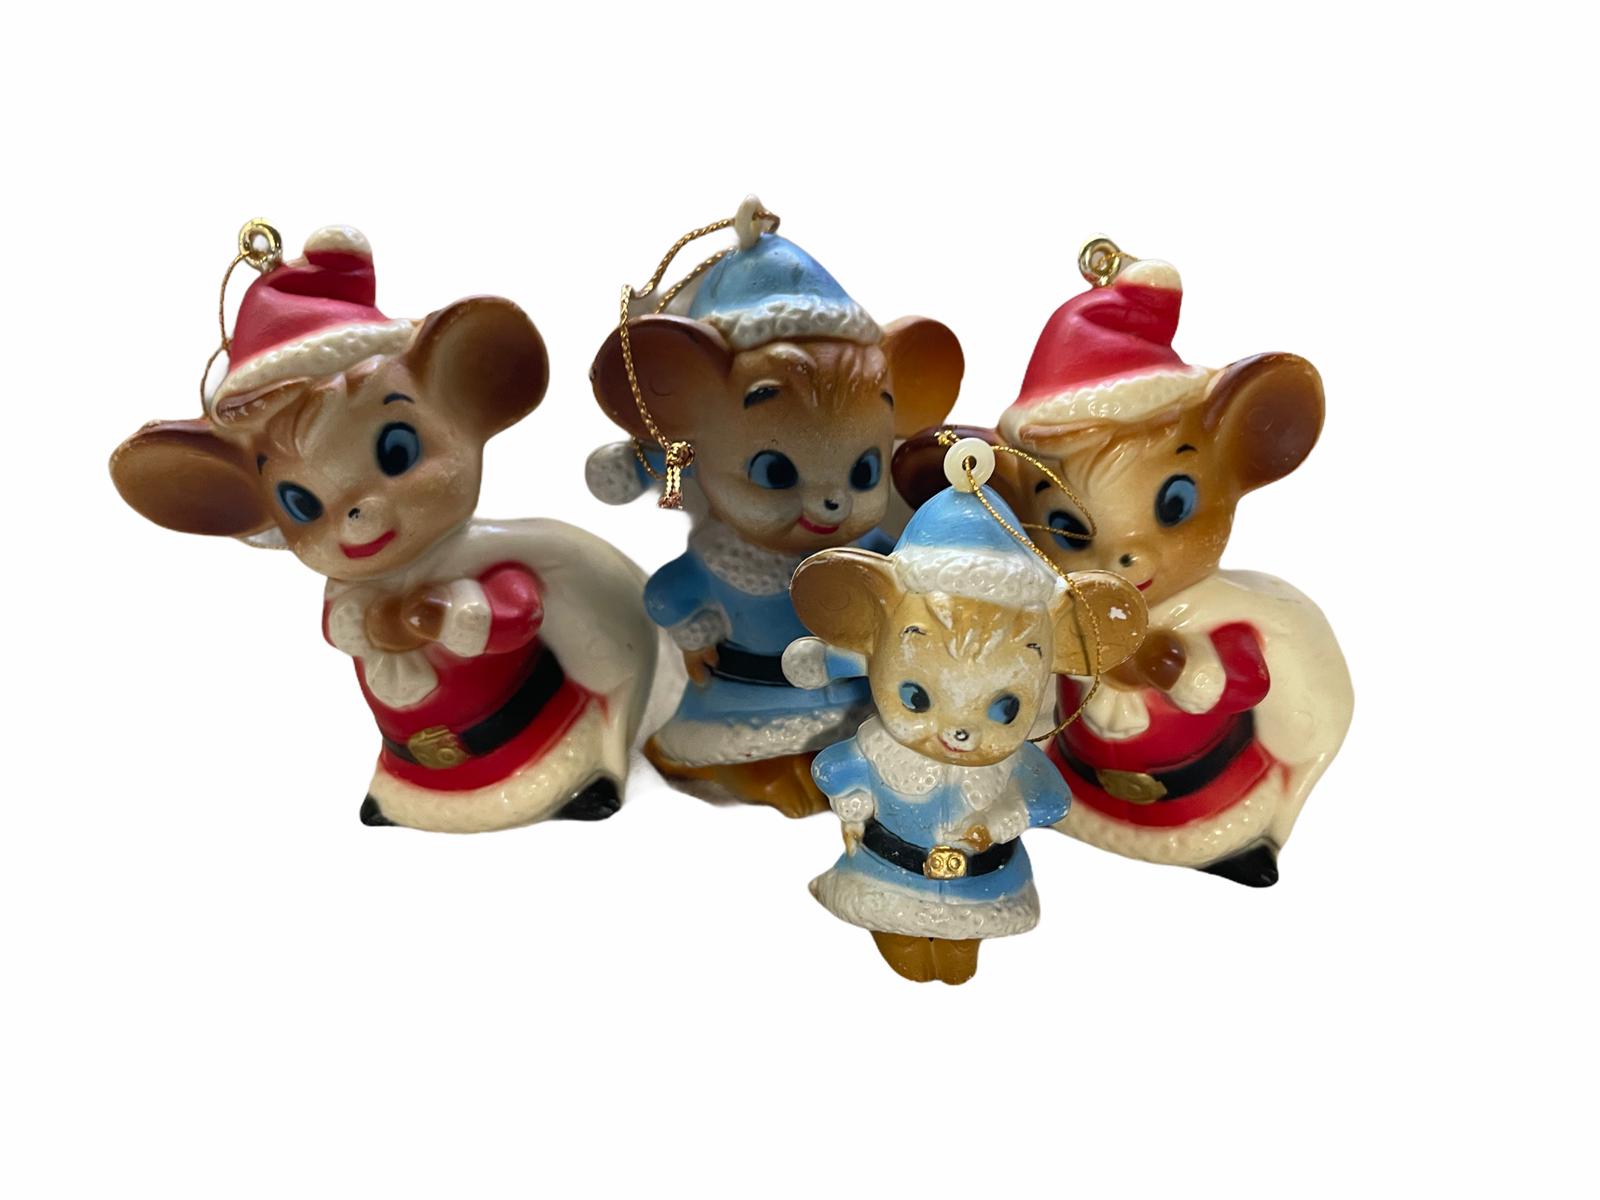 Vintage Mice Santa Set of 4 Homco Bisque Porcelain Christmas Tree Ornaments - $29.99